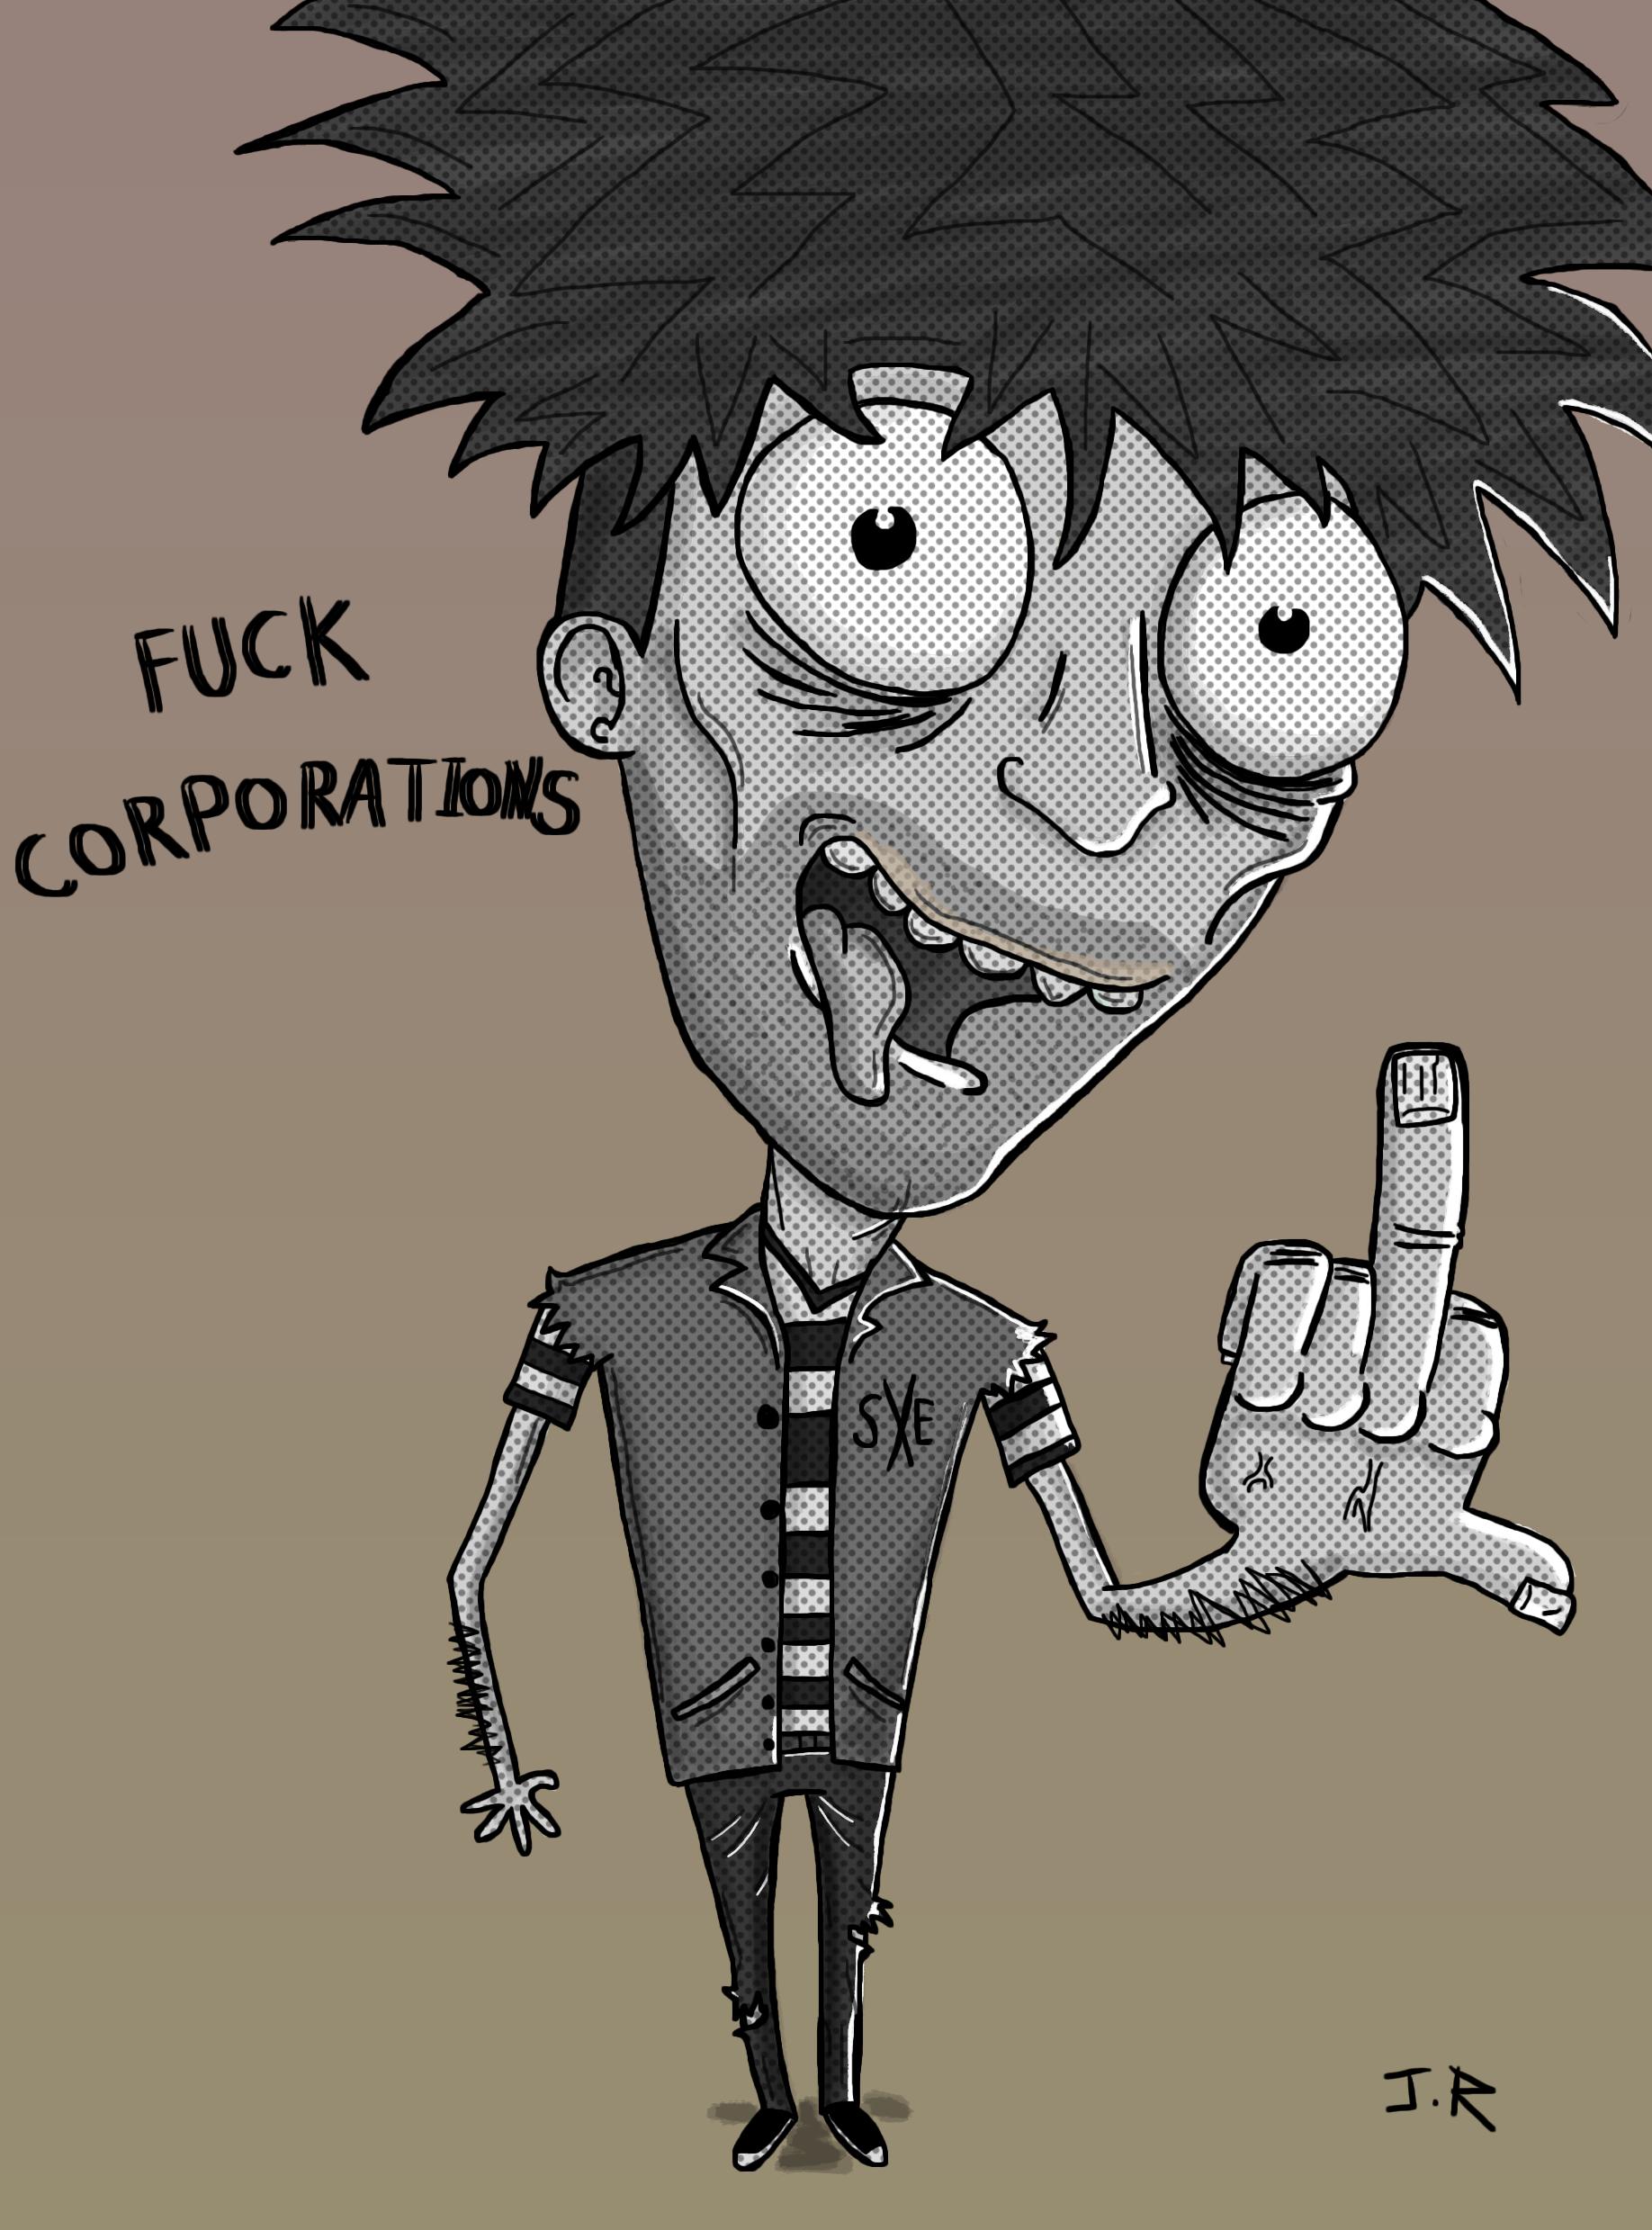 F*** CORPORATIONS